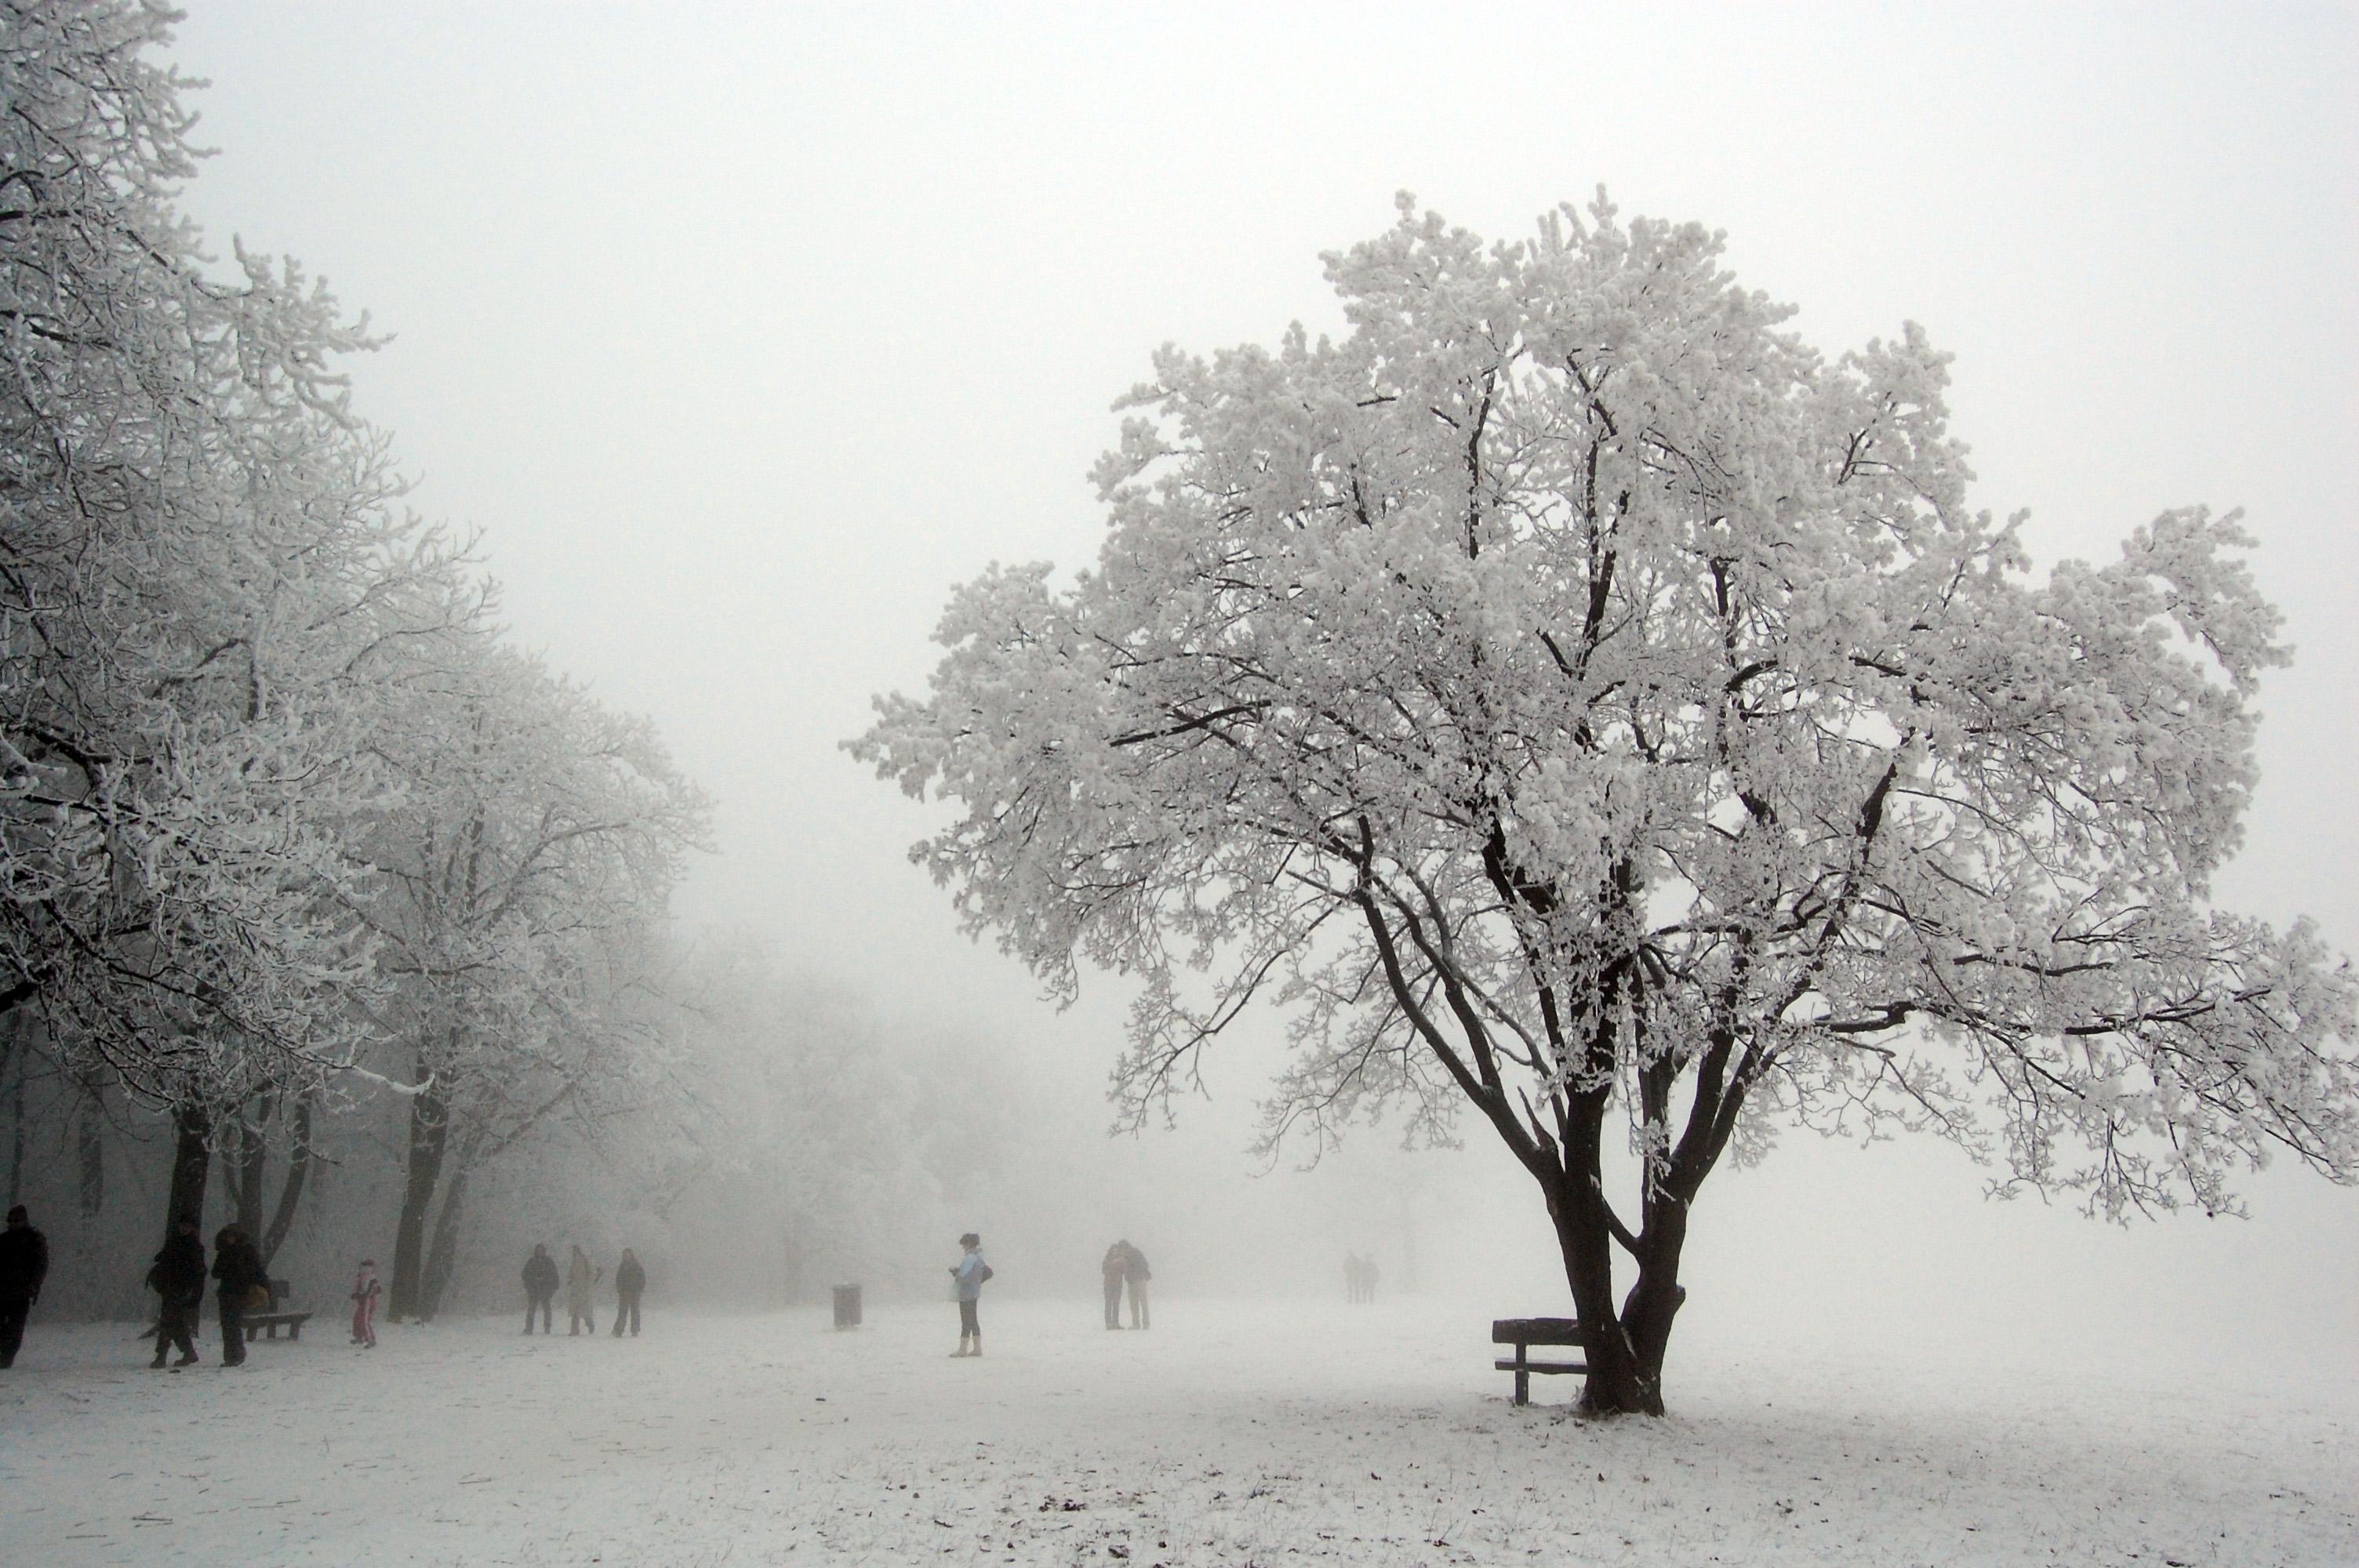 winter-in-budapest-hungary.jpg